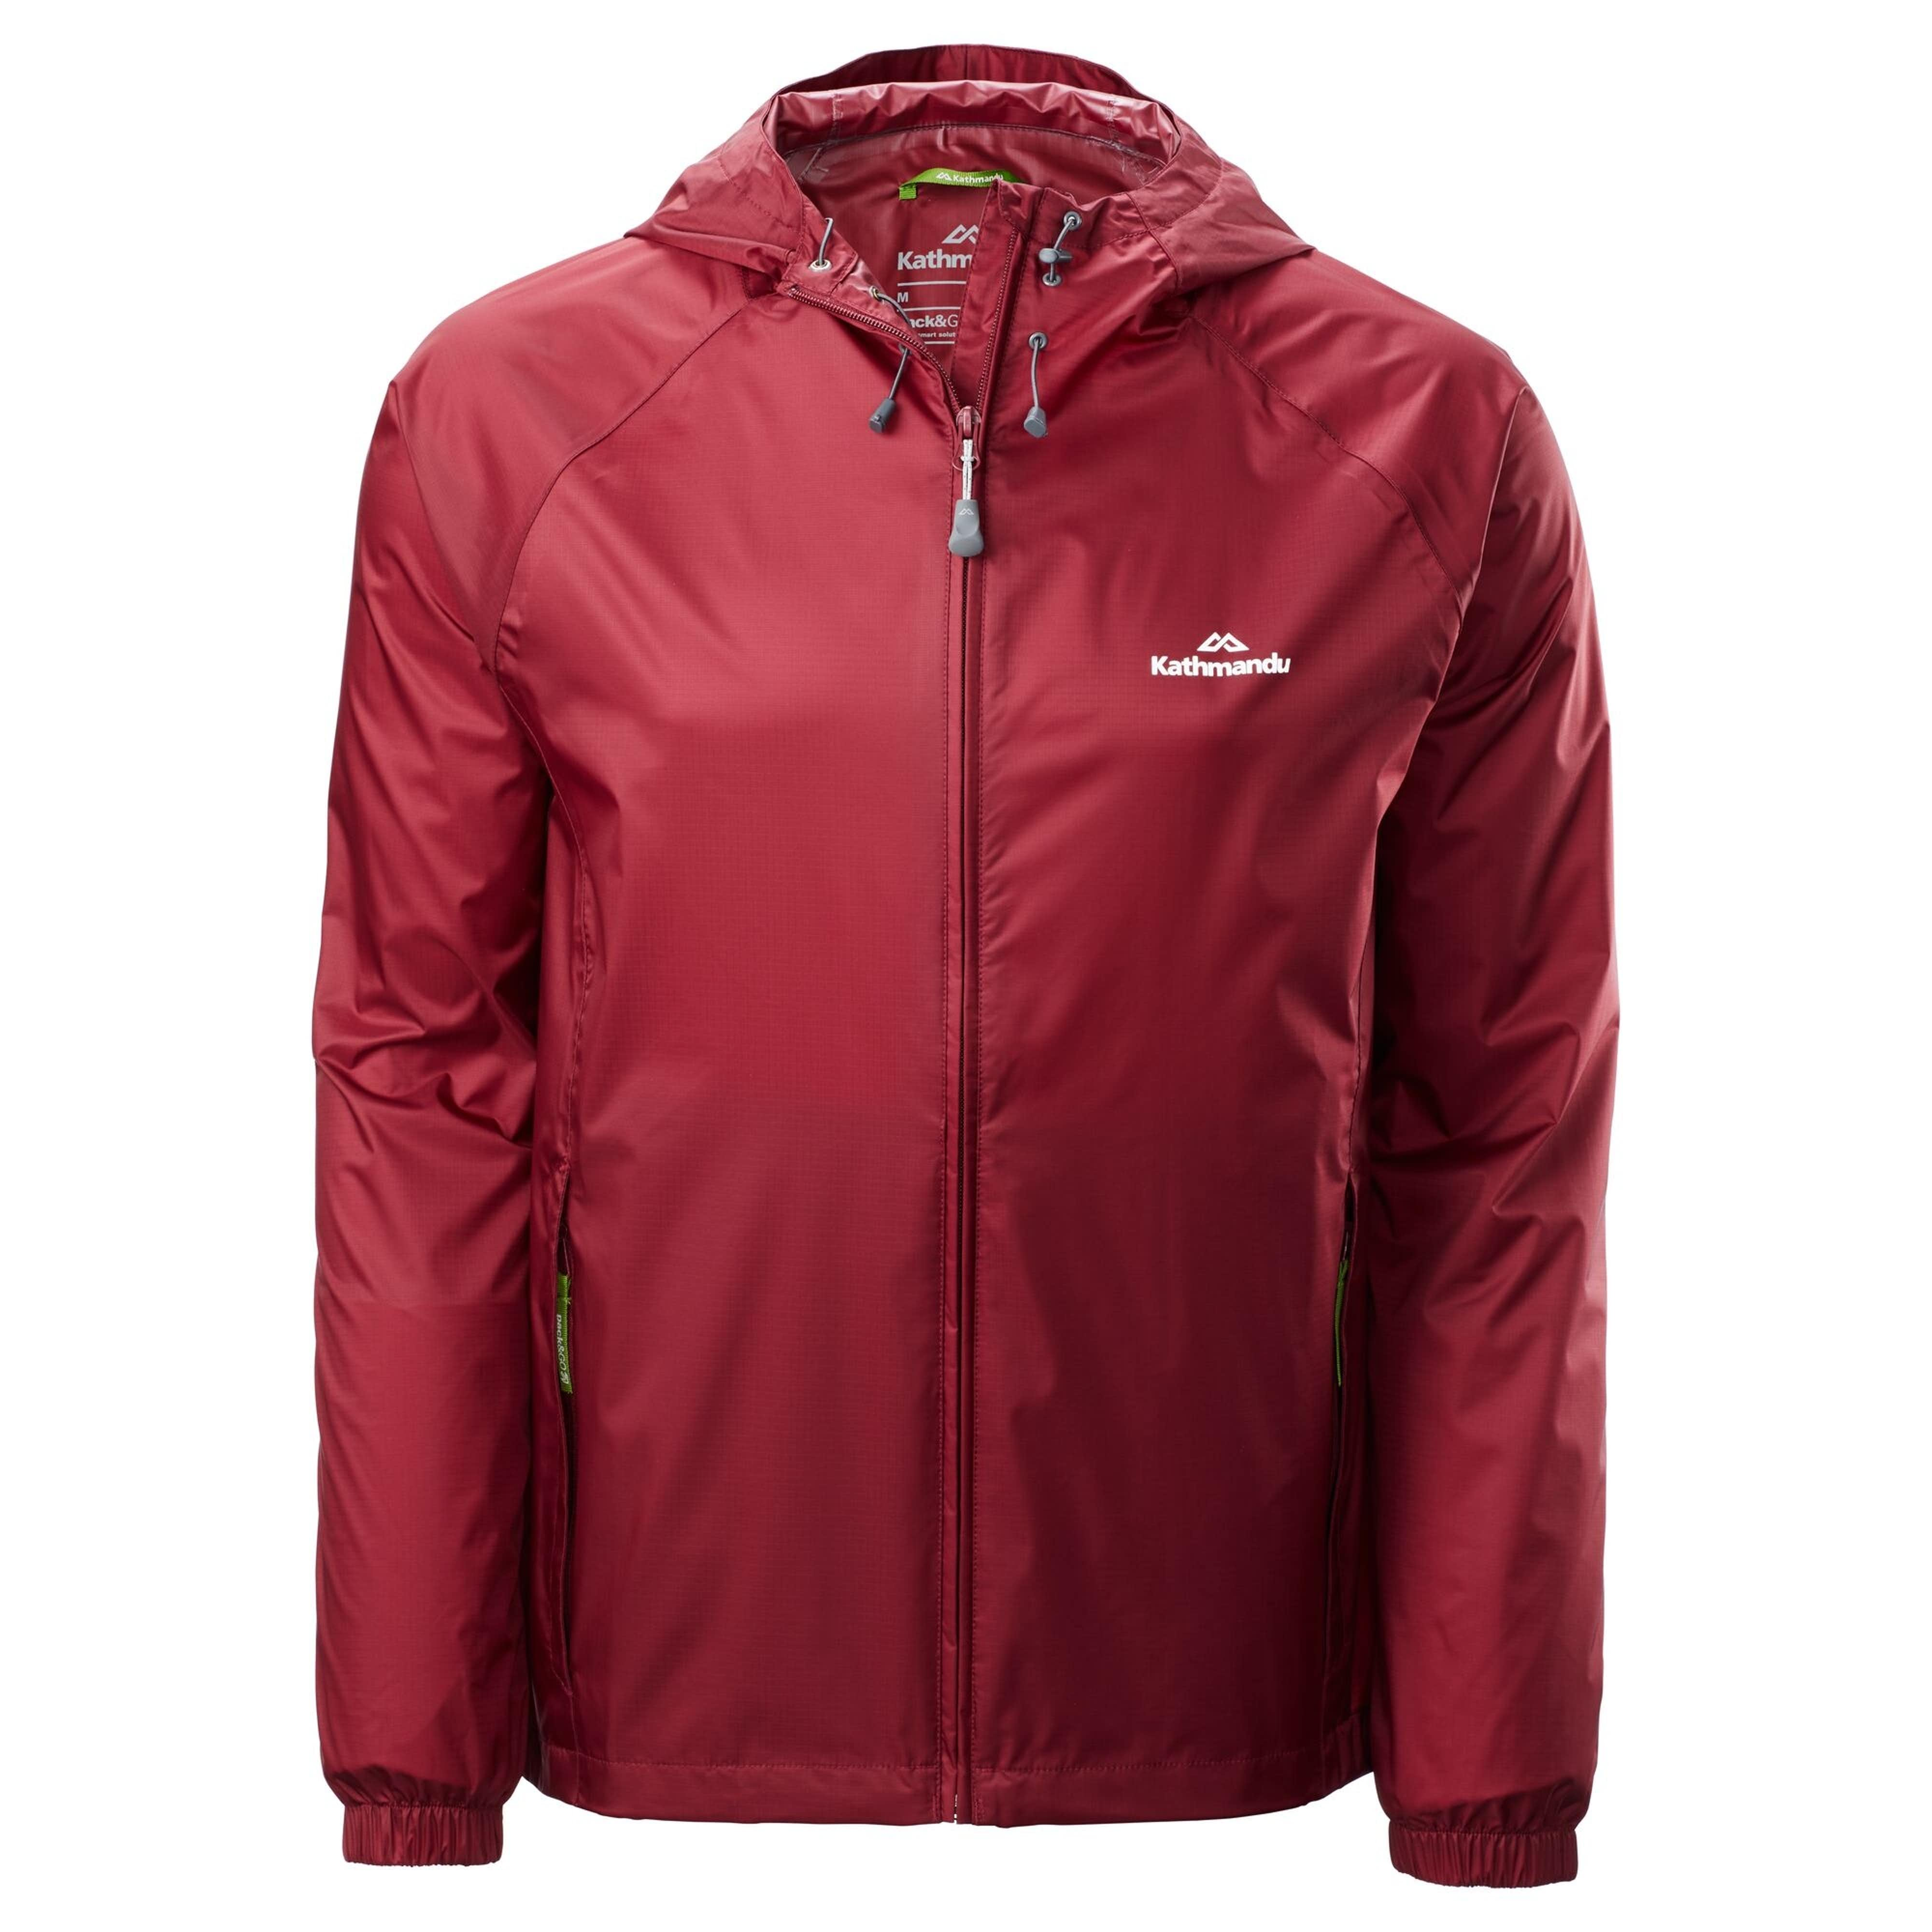 9c6a90c6c2f Mens Jackets for Sale Online